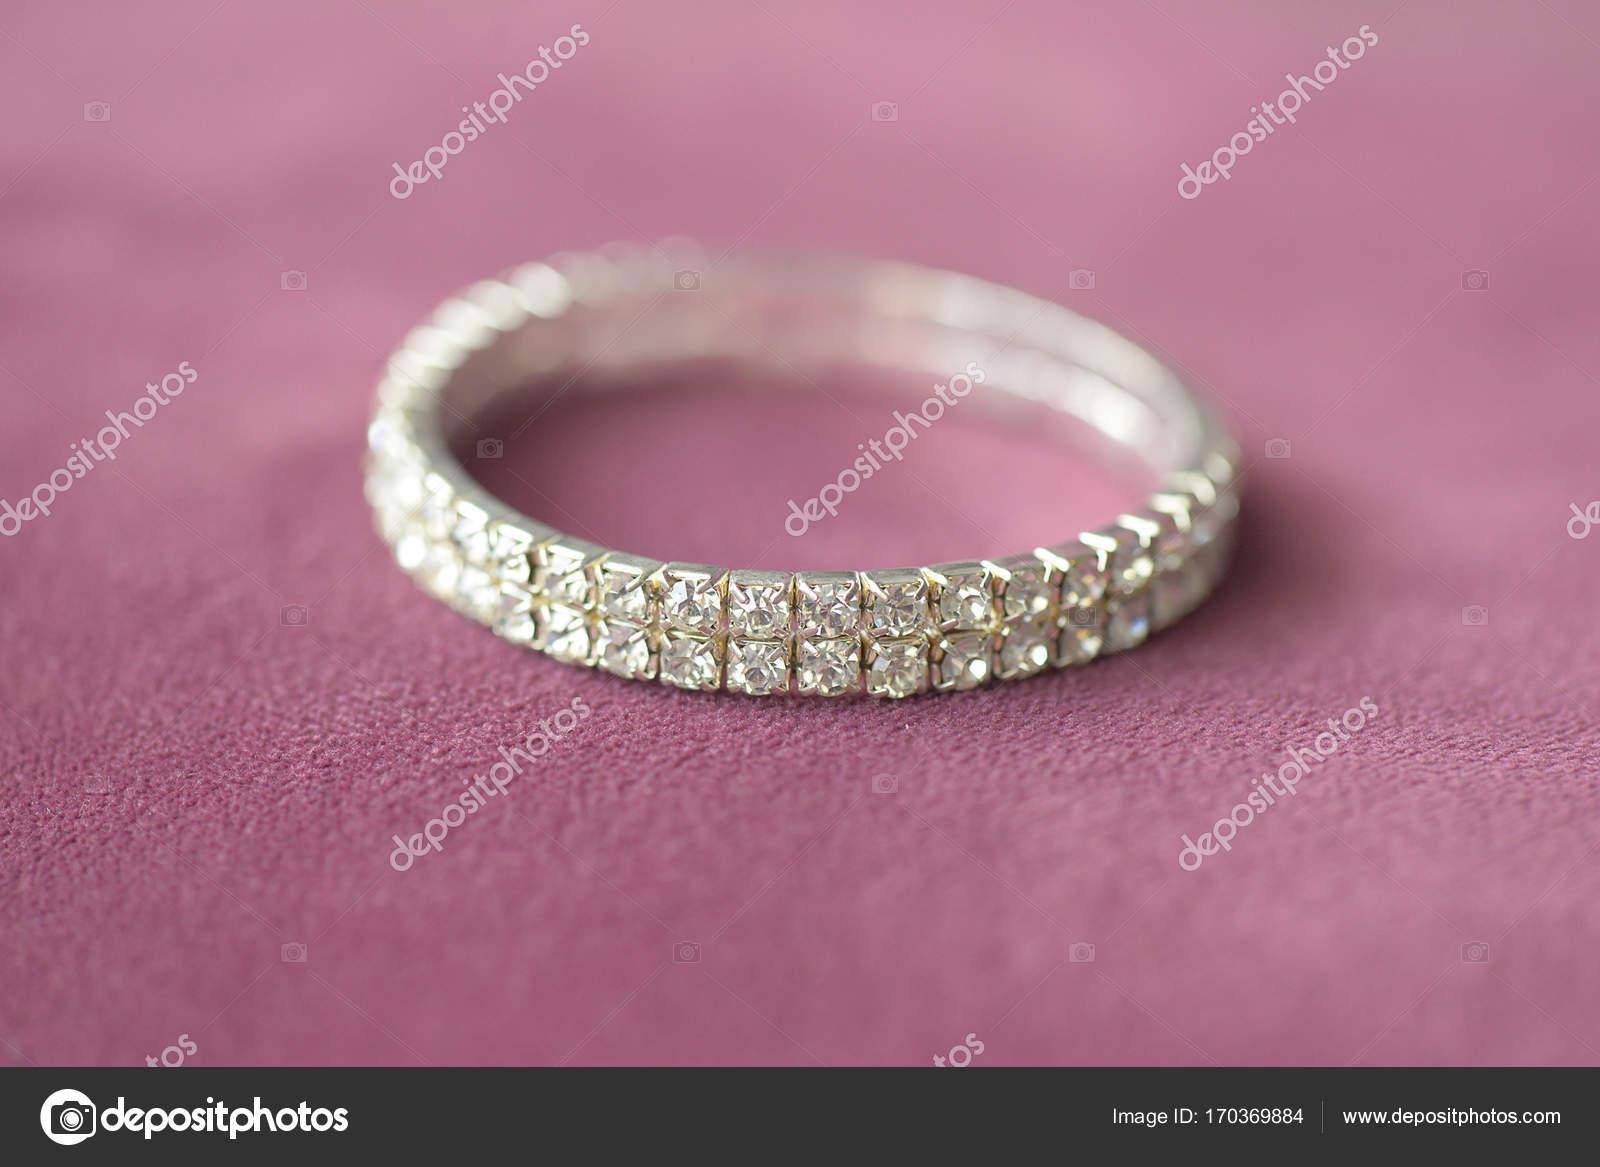 Fake diamonds double row prong setting mount bracelet with selective ...